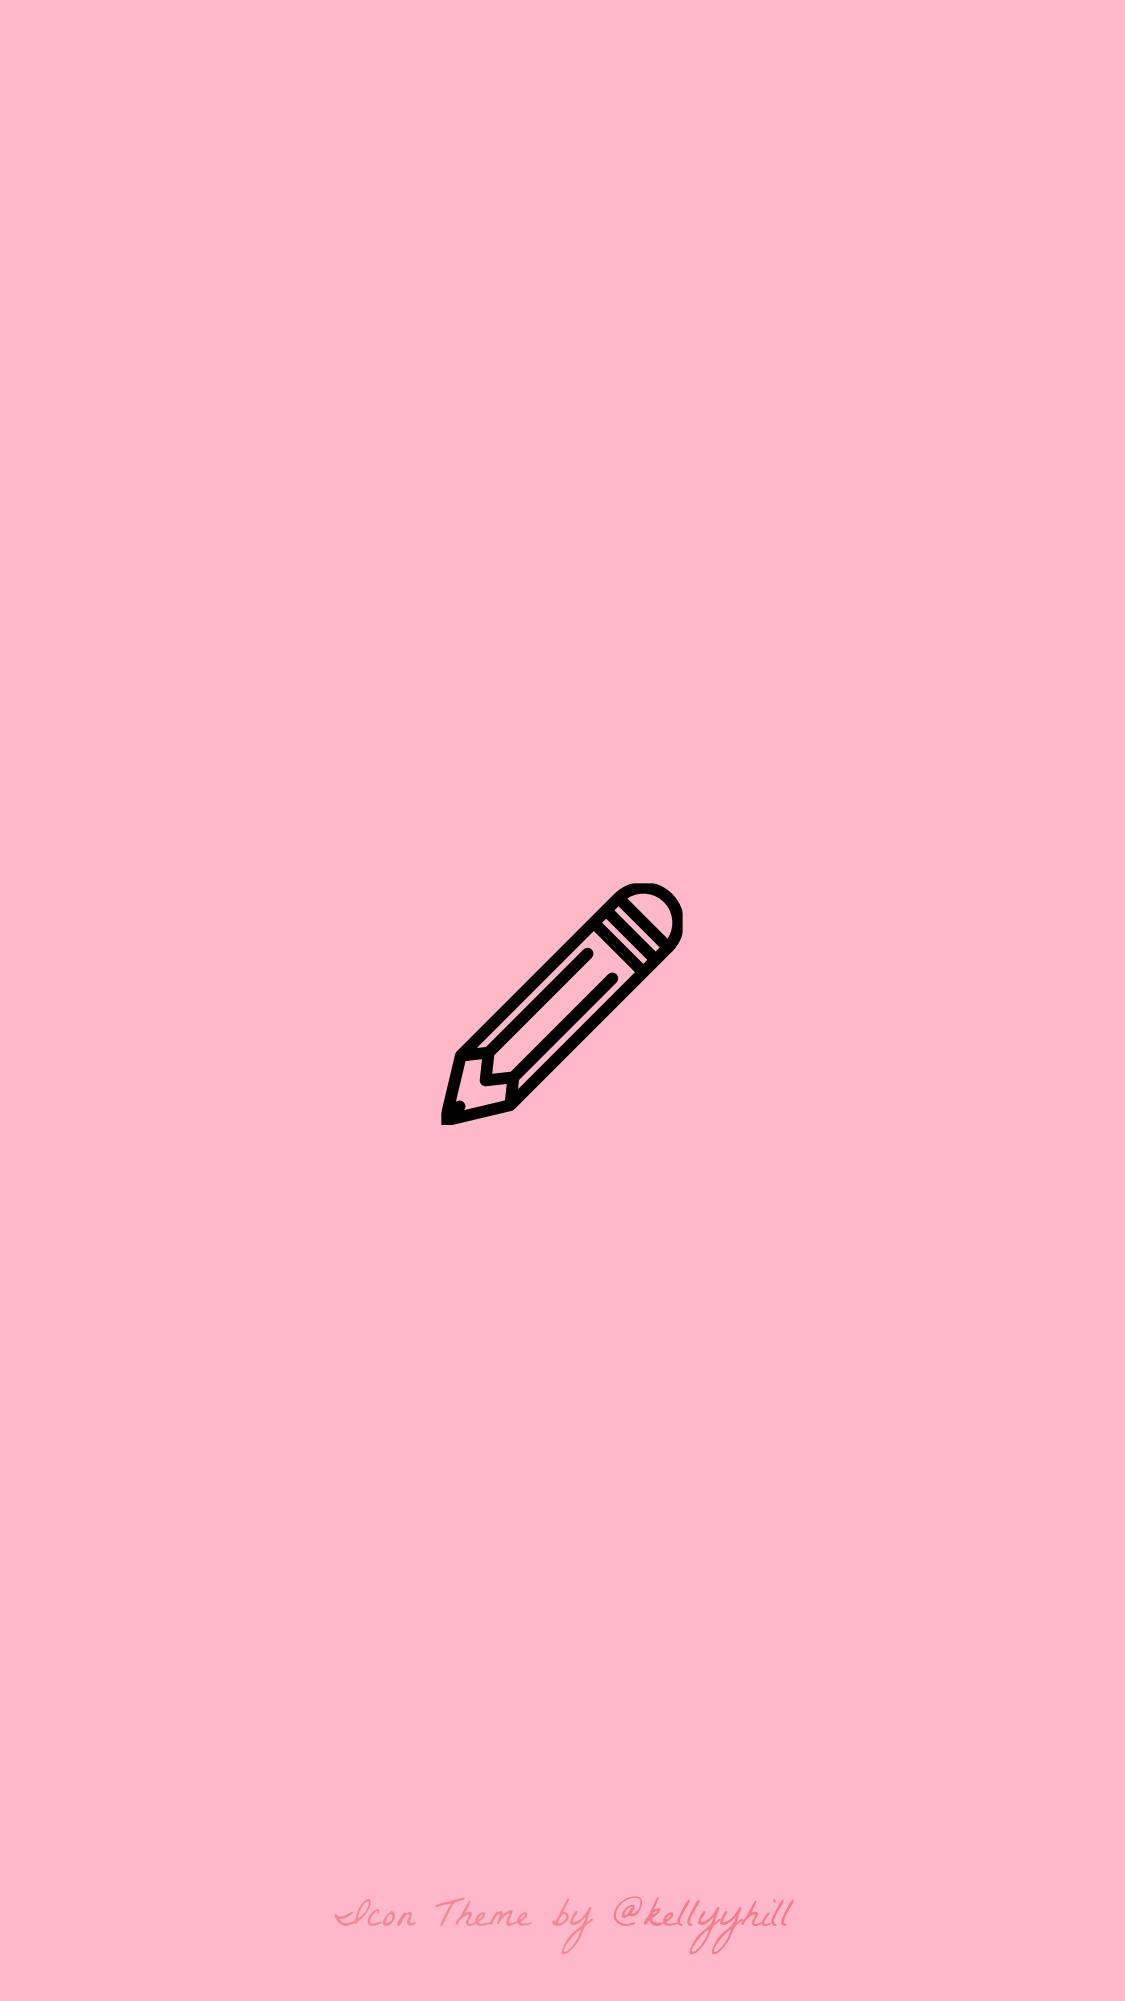 Wallpaper Aesthetic Wallpaper Pastel Pink Youtube Logo